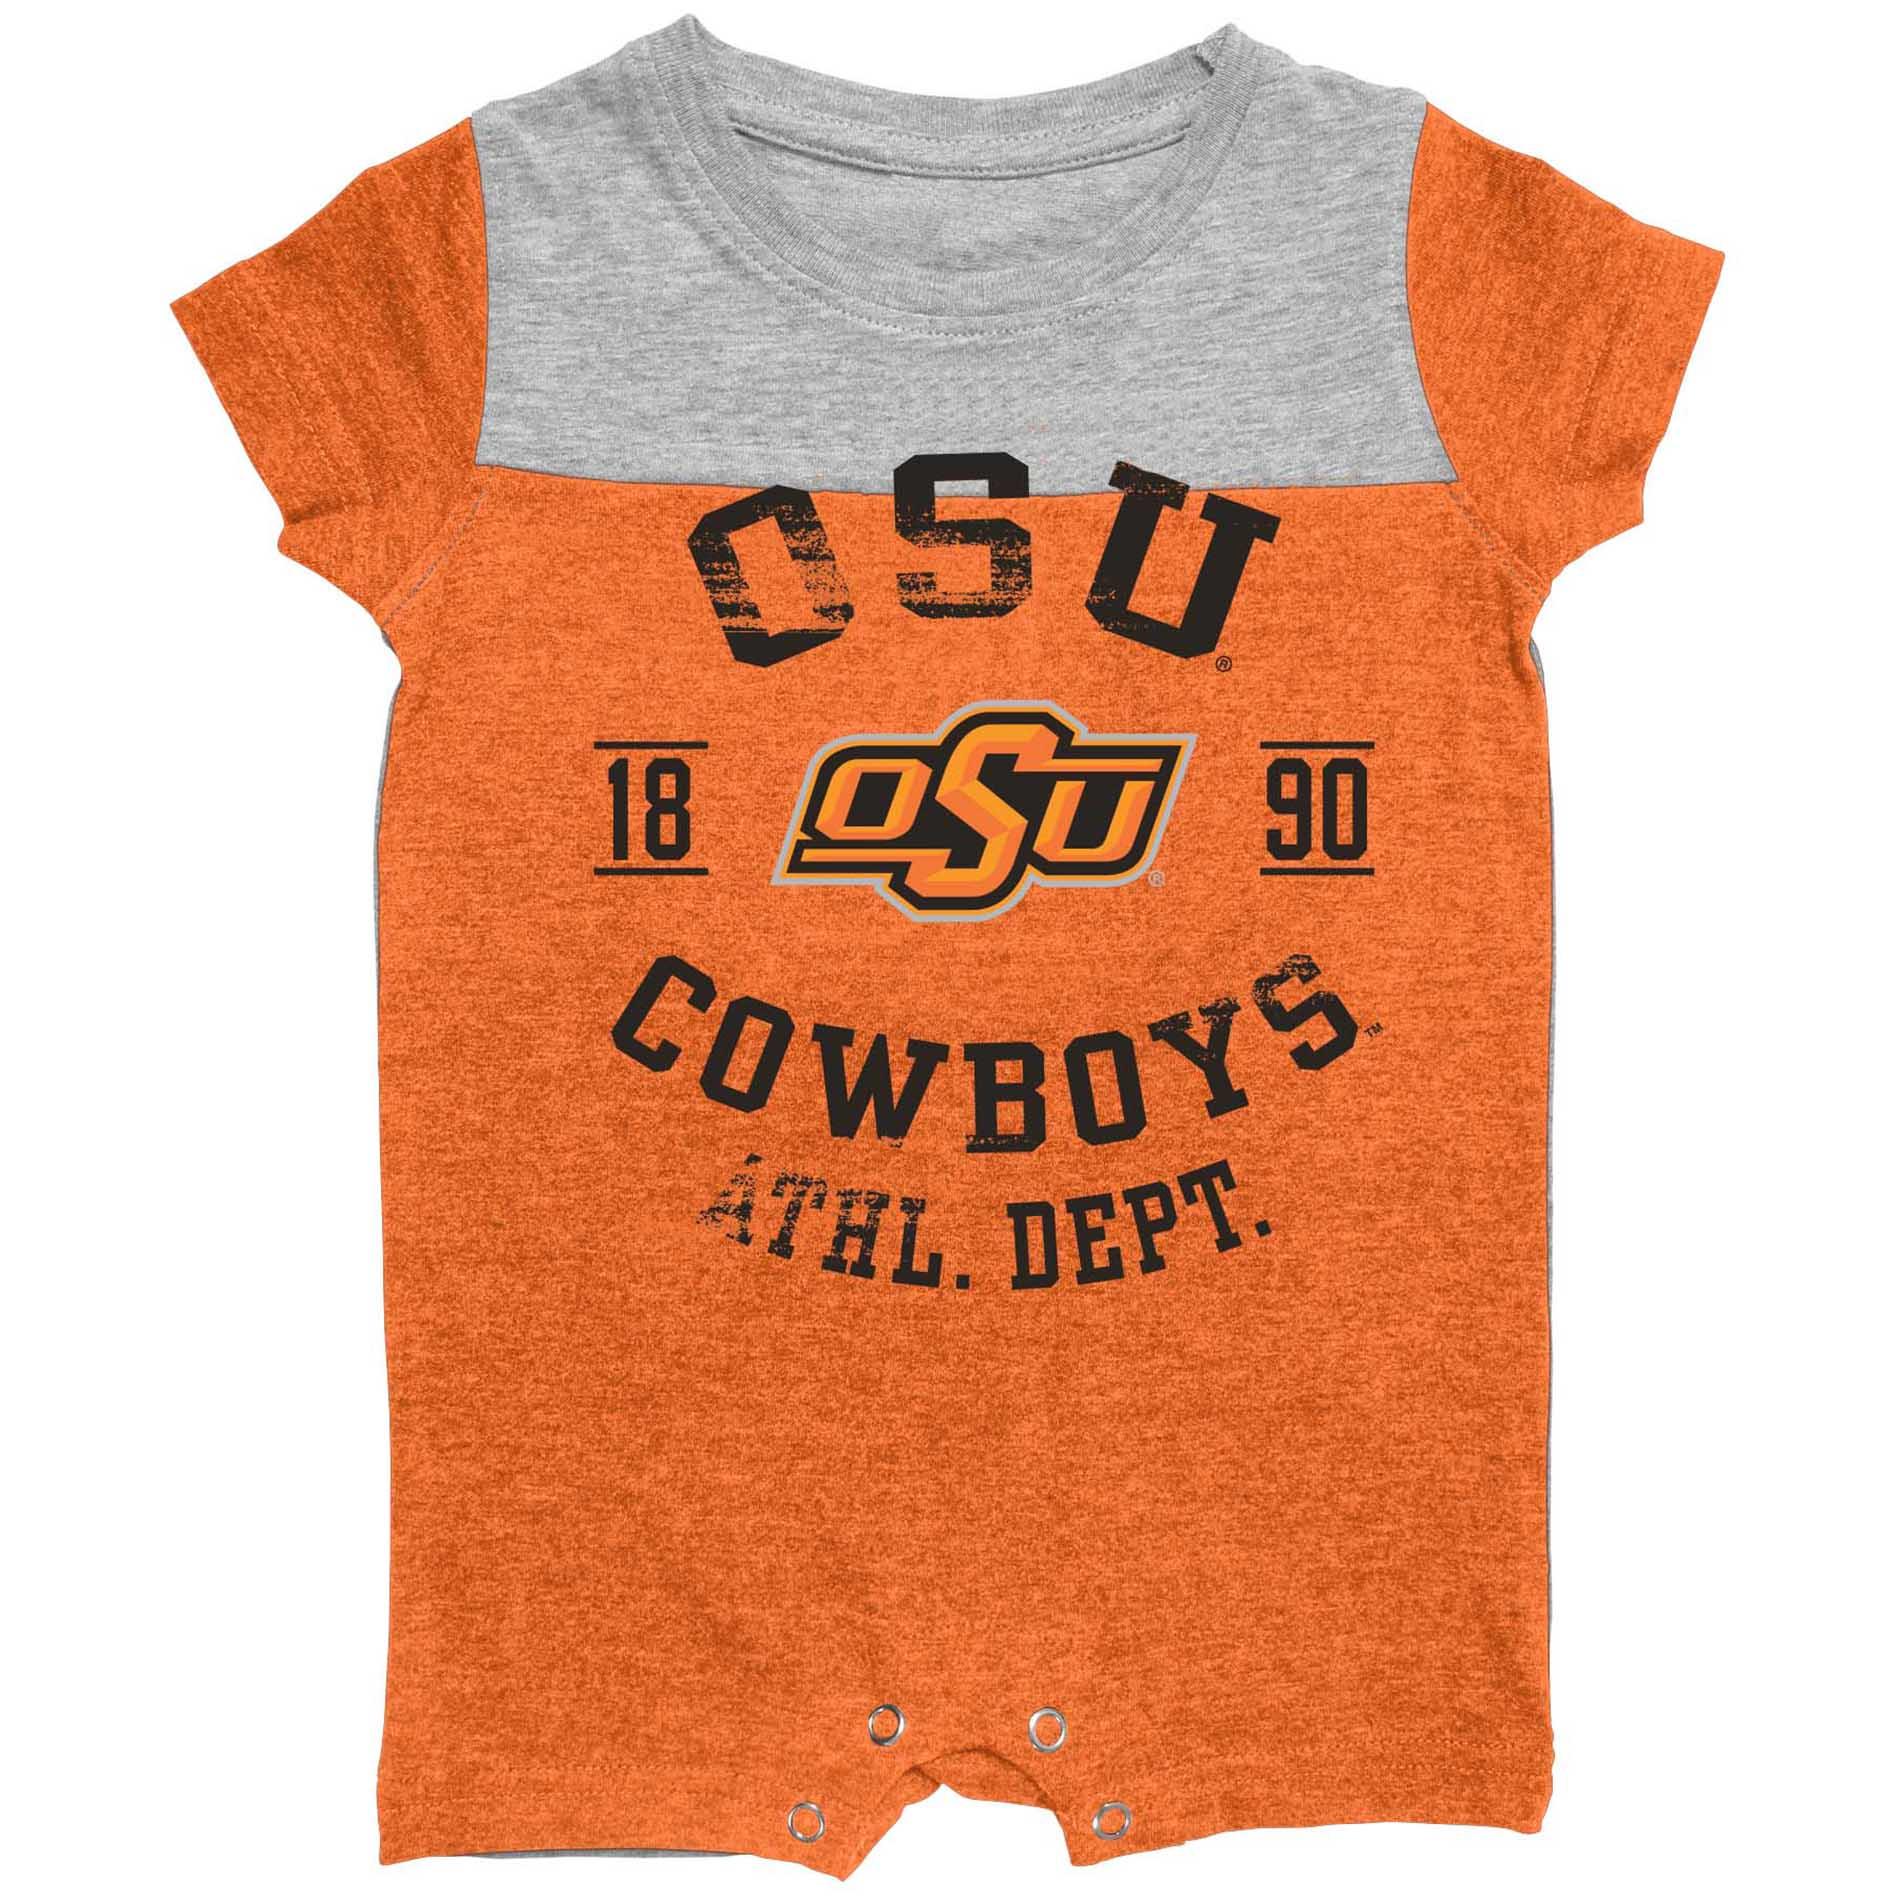 Infant Oklahoma State University–Stillwater Cowboys and Cowgirls Romper PartNumber: 046VA88333812P MfgPartNumber: 7ARJC05KMF